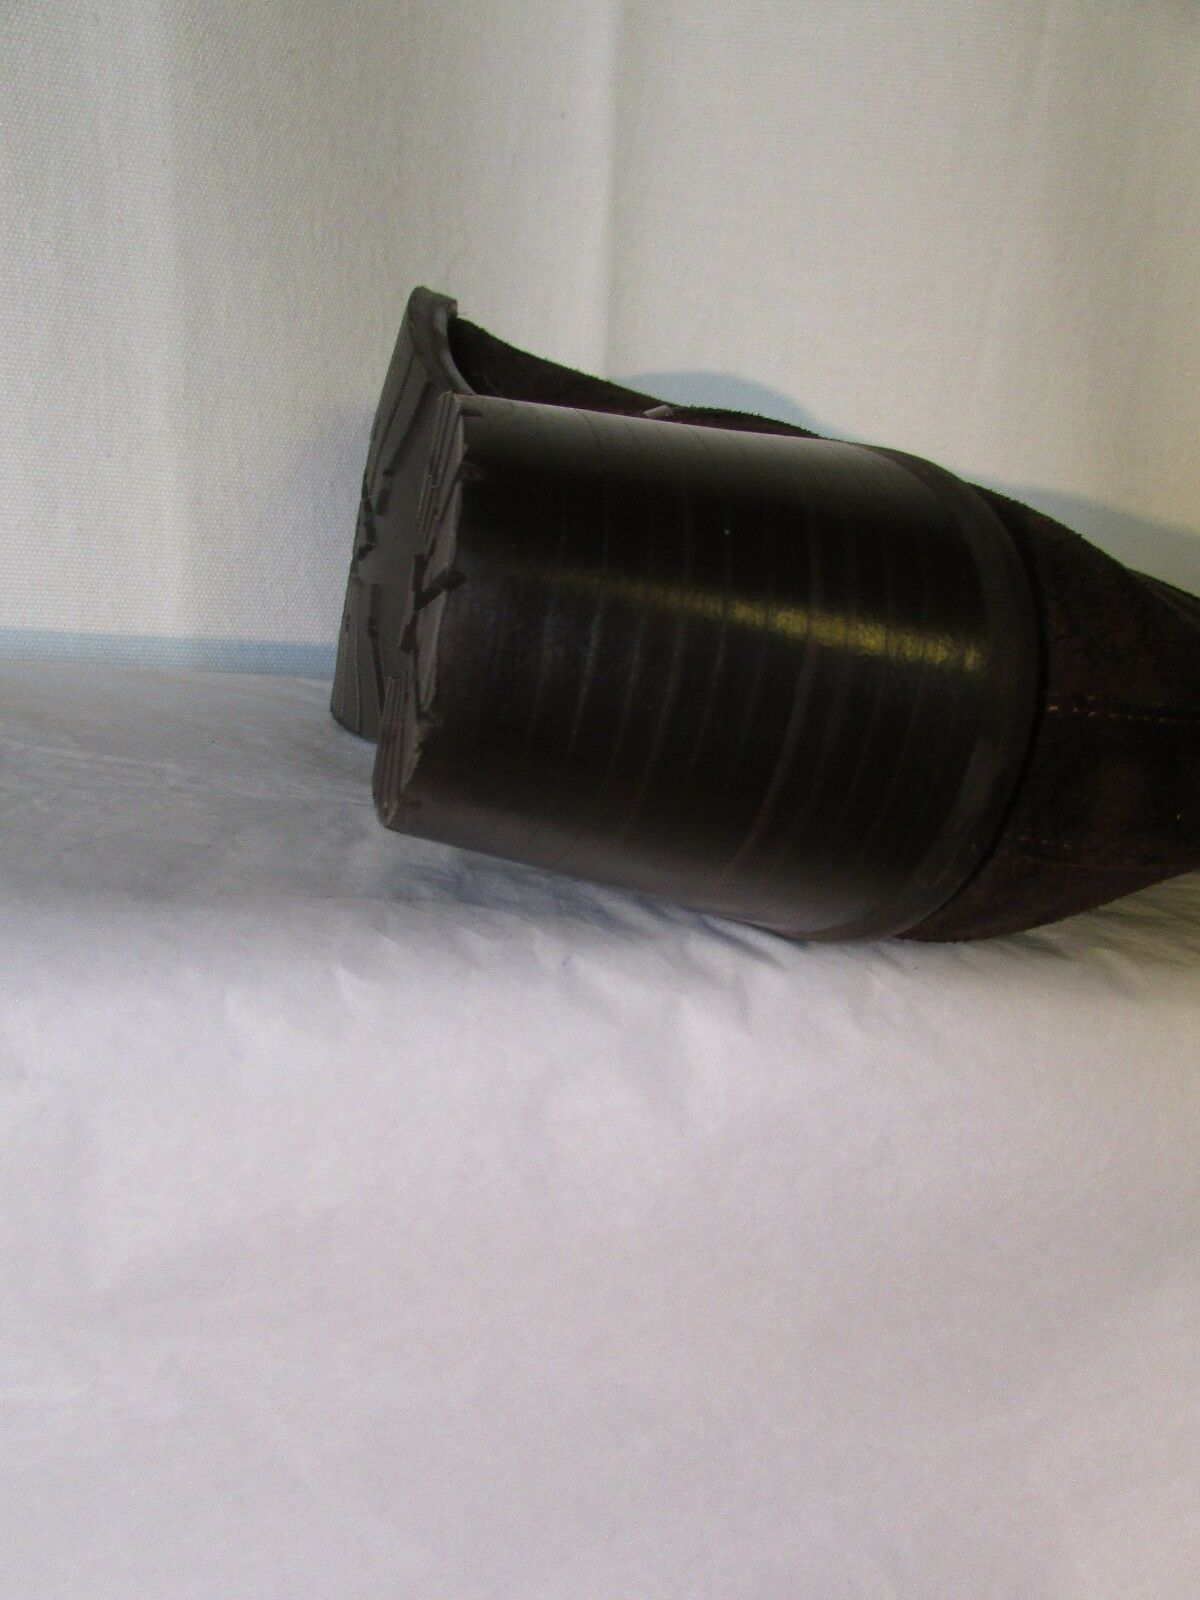 Bottines Bottines Bottines AIGLE nubuck brown  39 2613e5